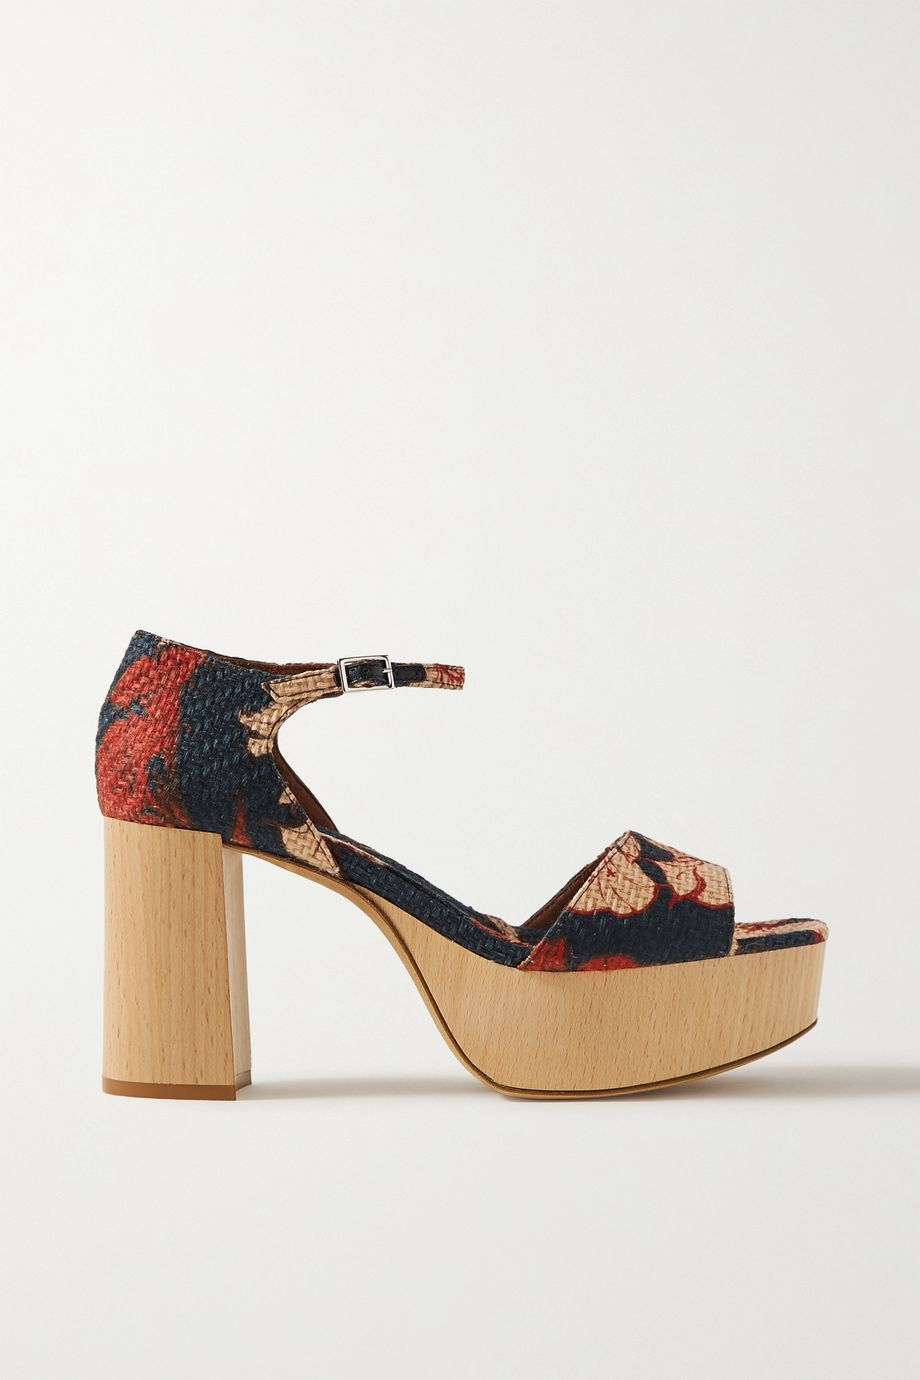 Tabitha Simmons + Johanna Ortiz Patton floral-print raffia platform sandals